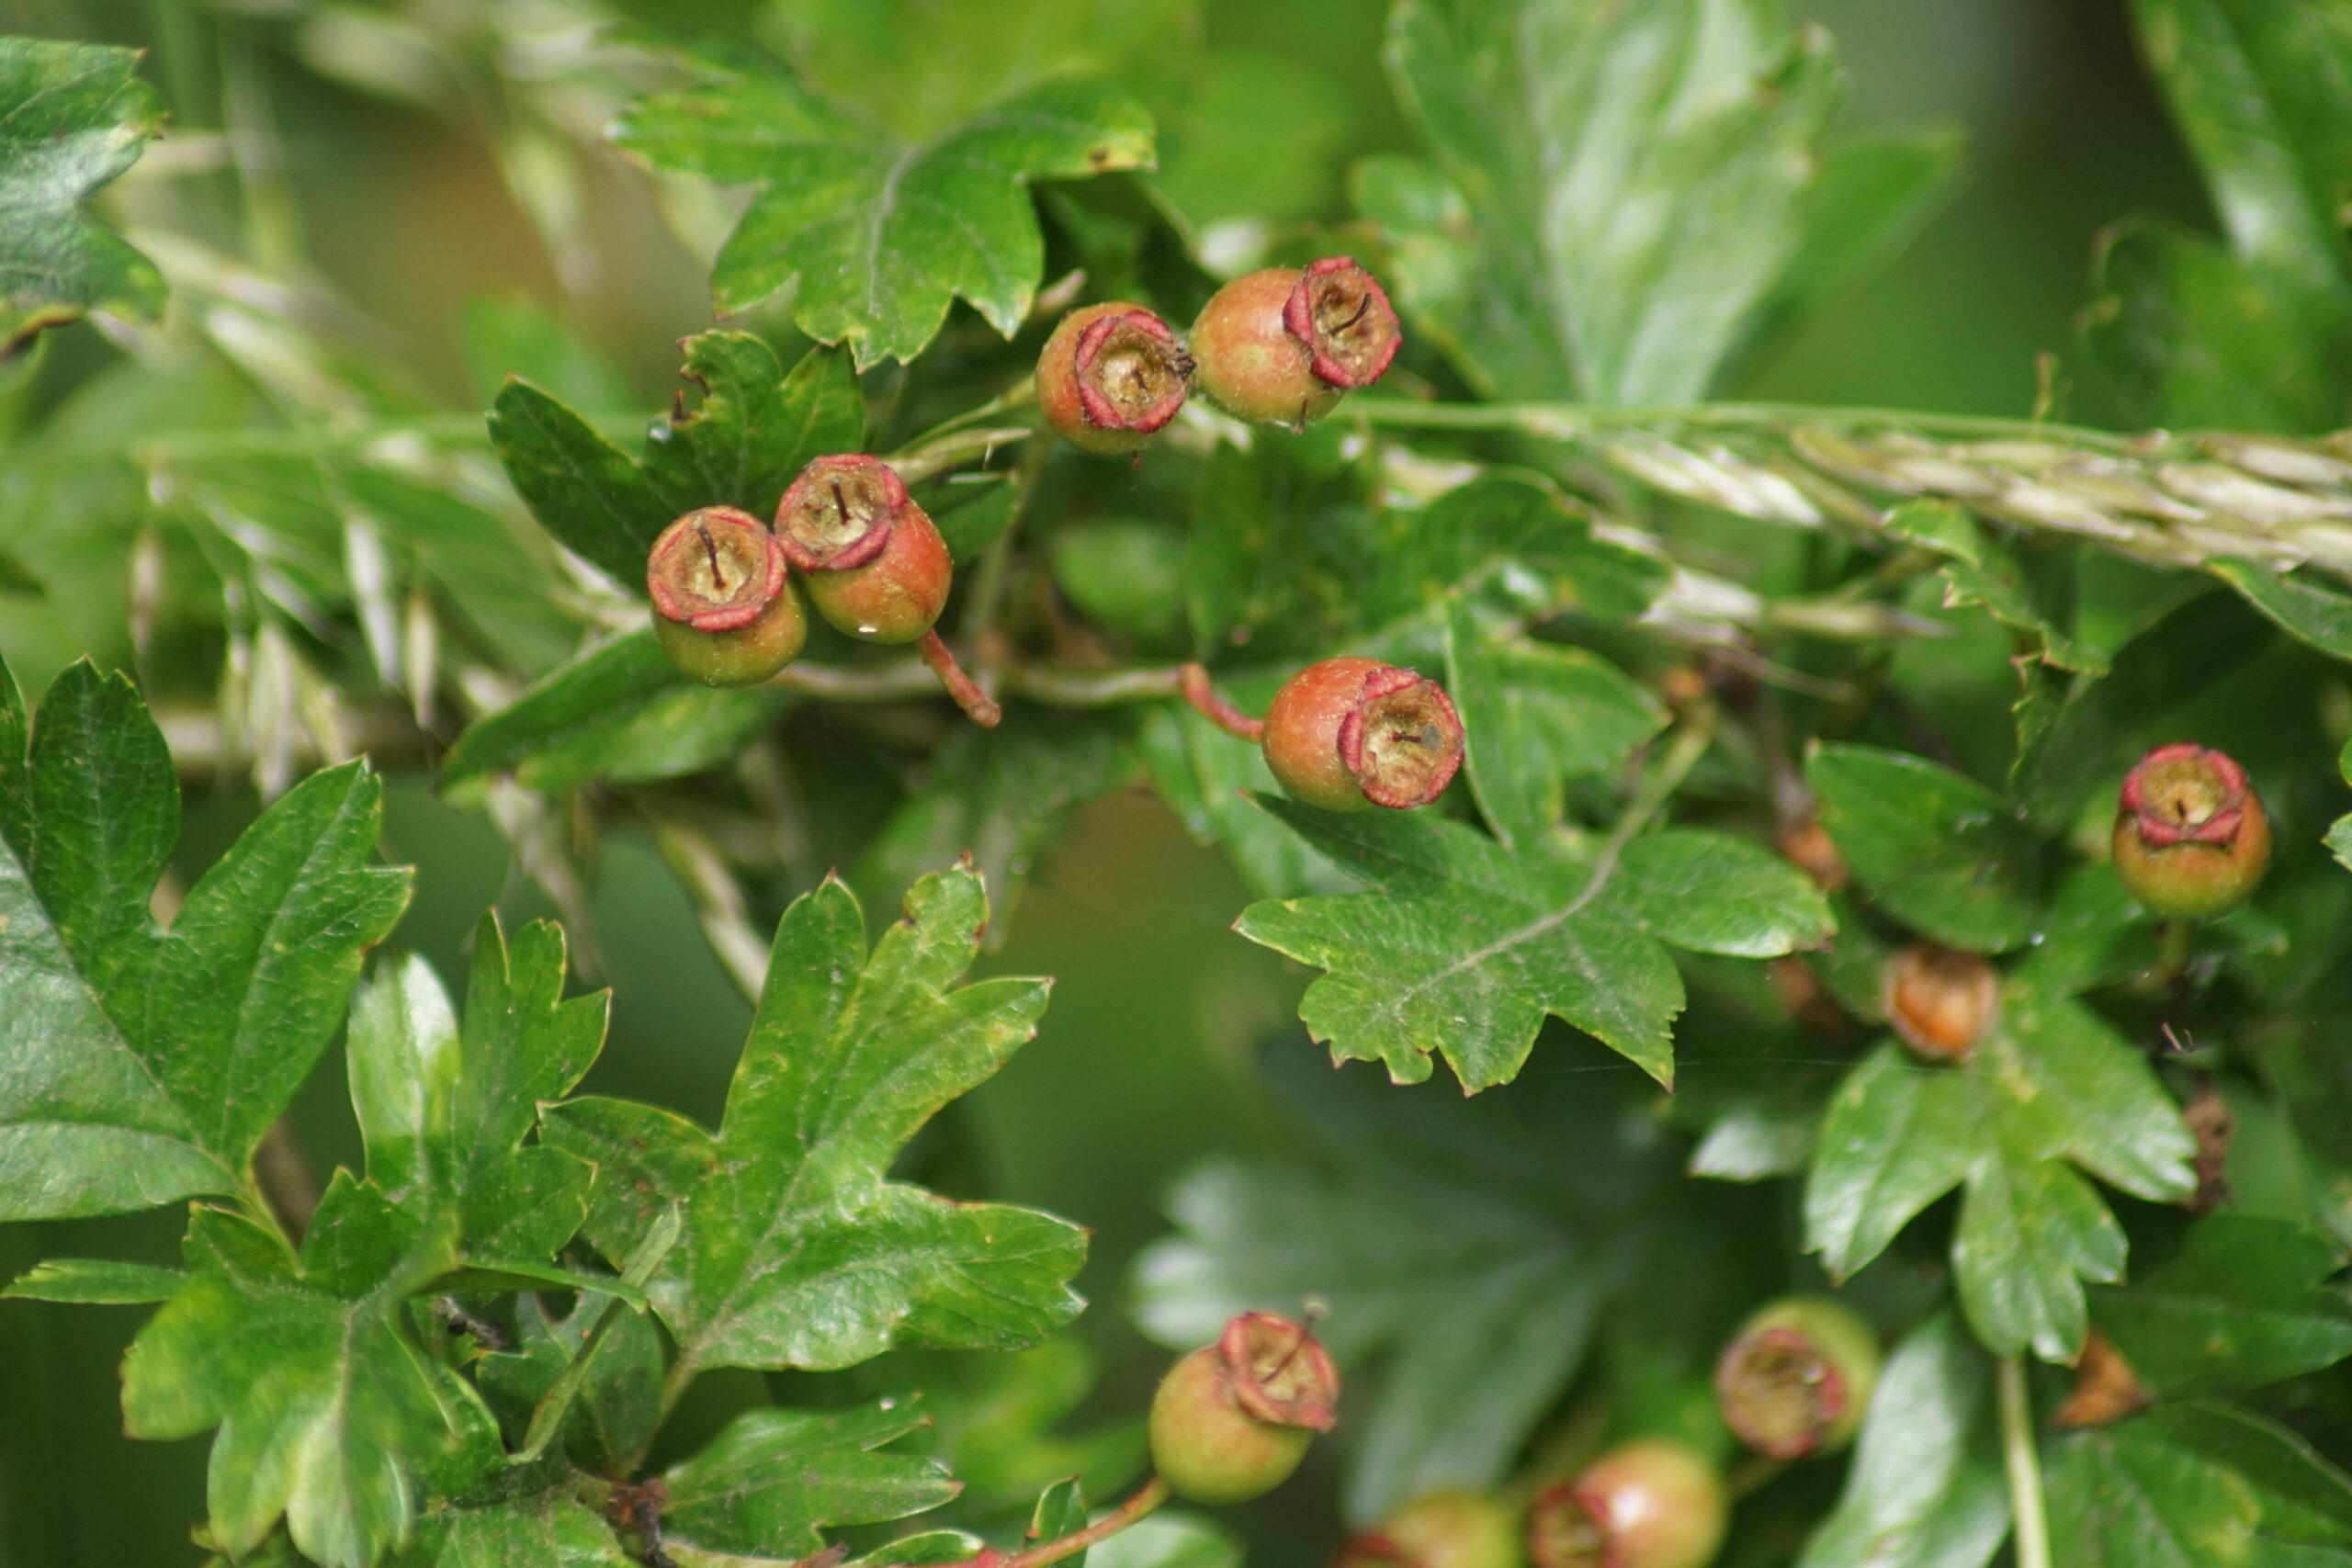 Haws developing on Hawthorn bush